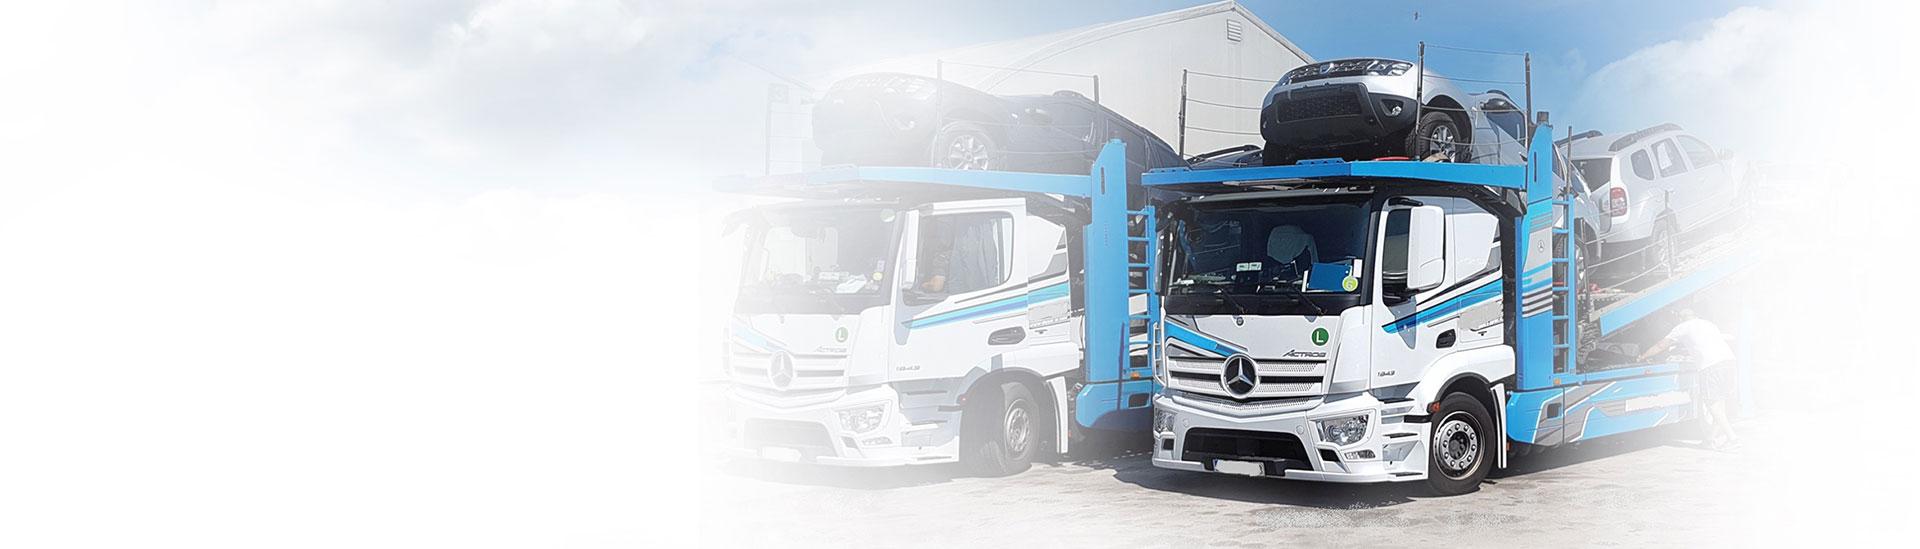 Vehicle transport